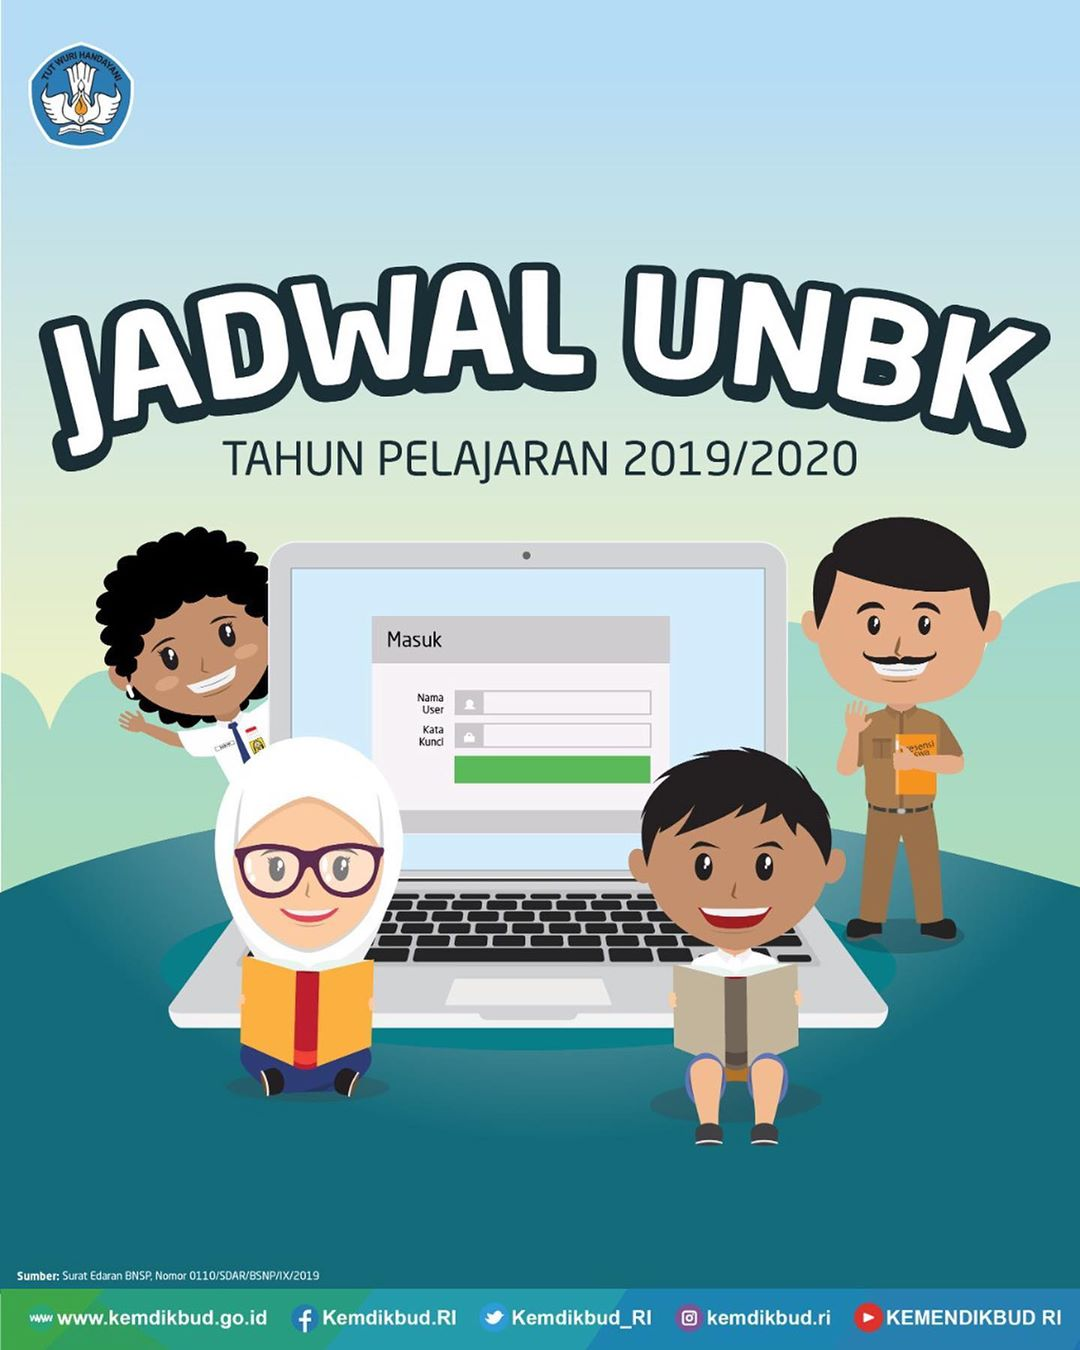 berikut jadwal ujian nasional (UN) tahun pelajaran 2019/2020